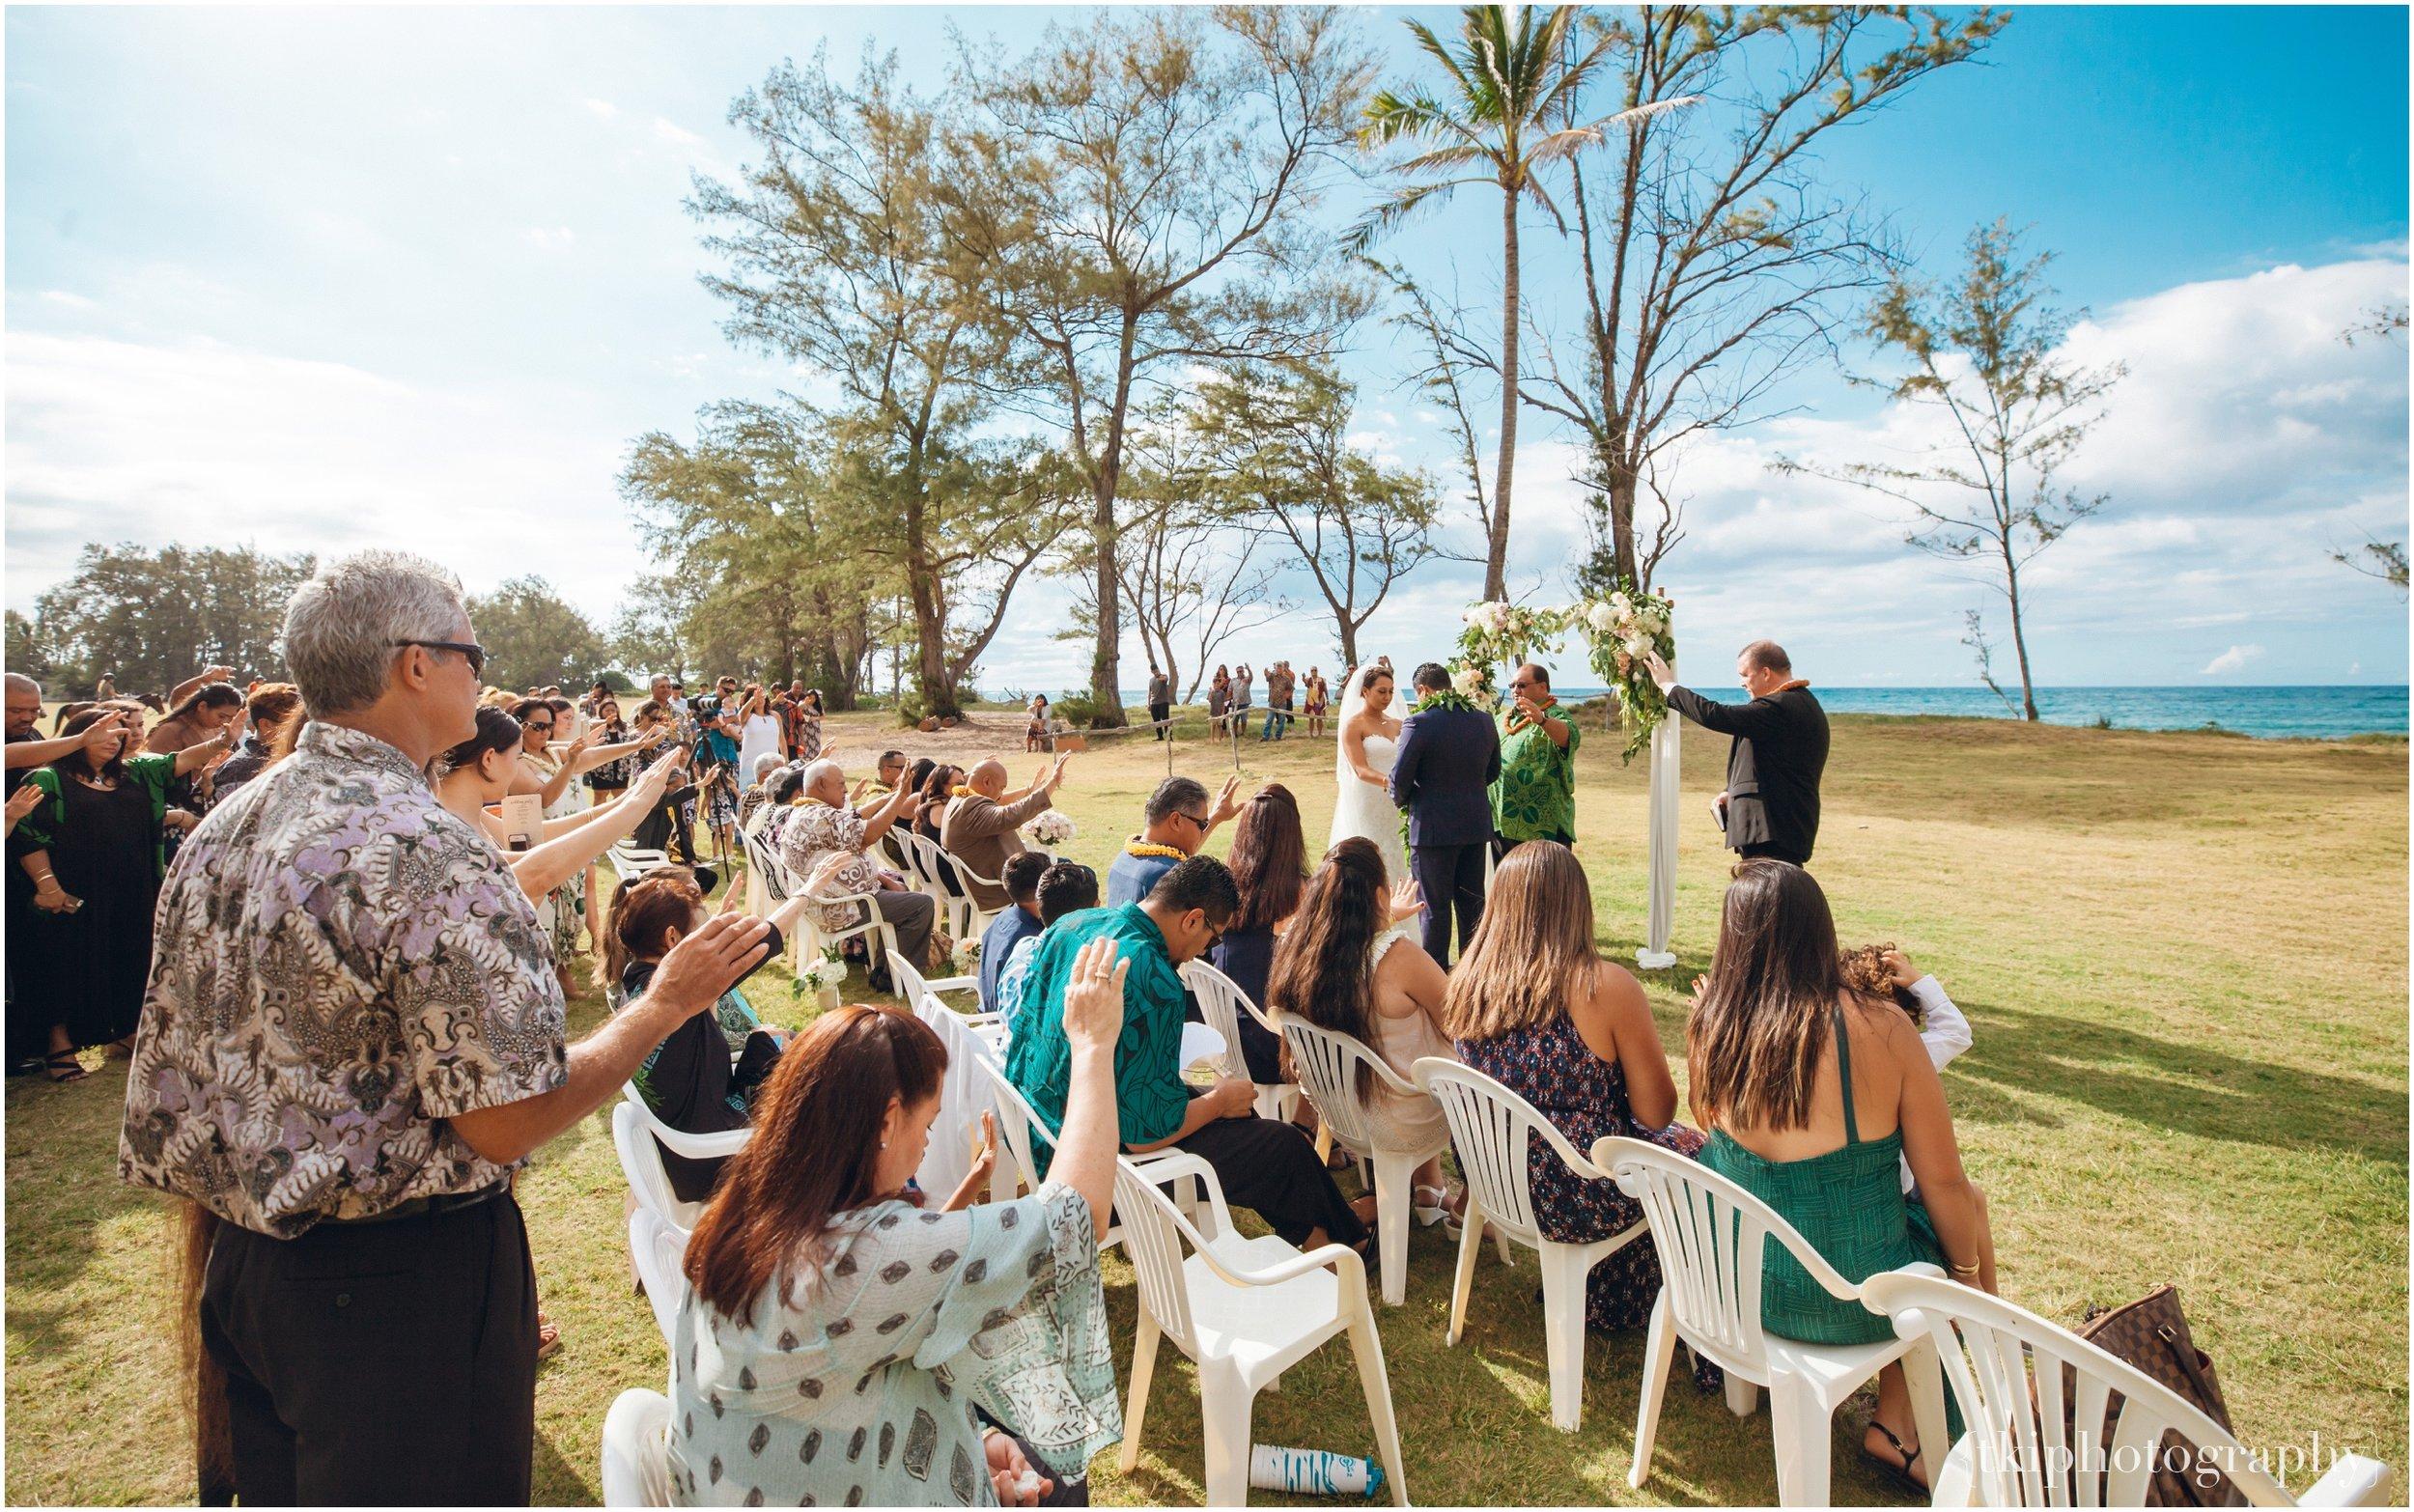 Oahu-Destination-Wedding-Beach_0091.jpg